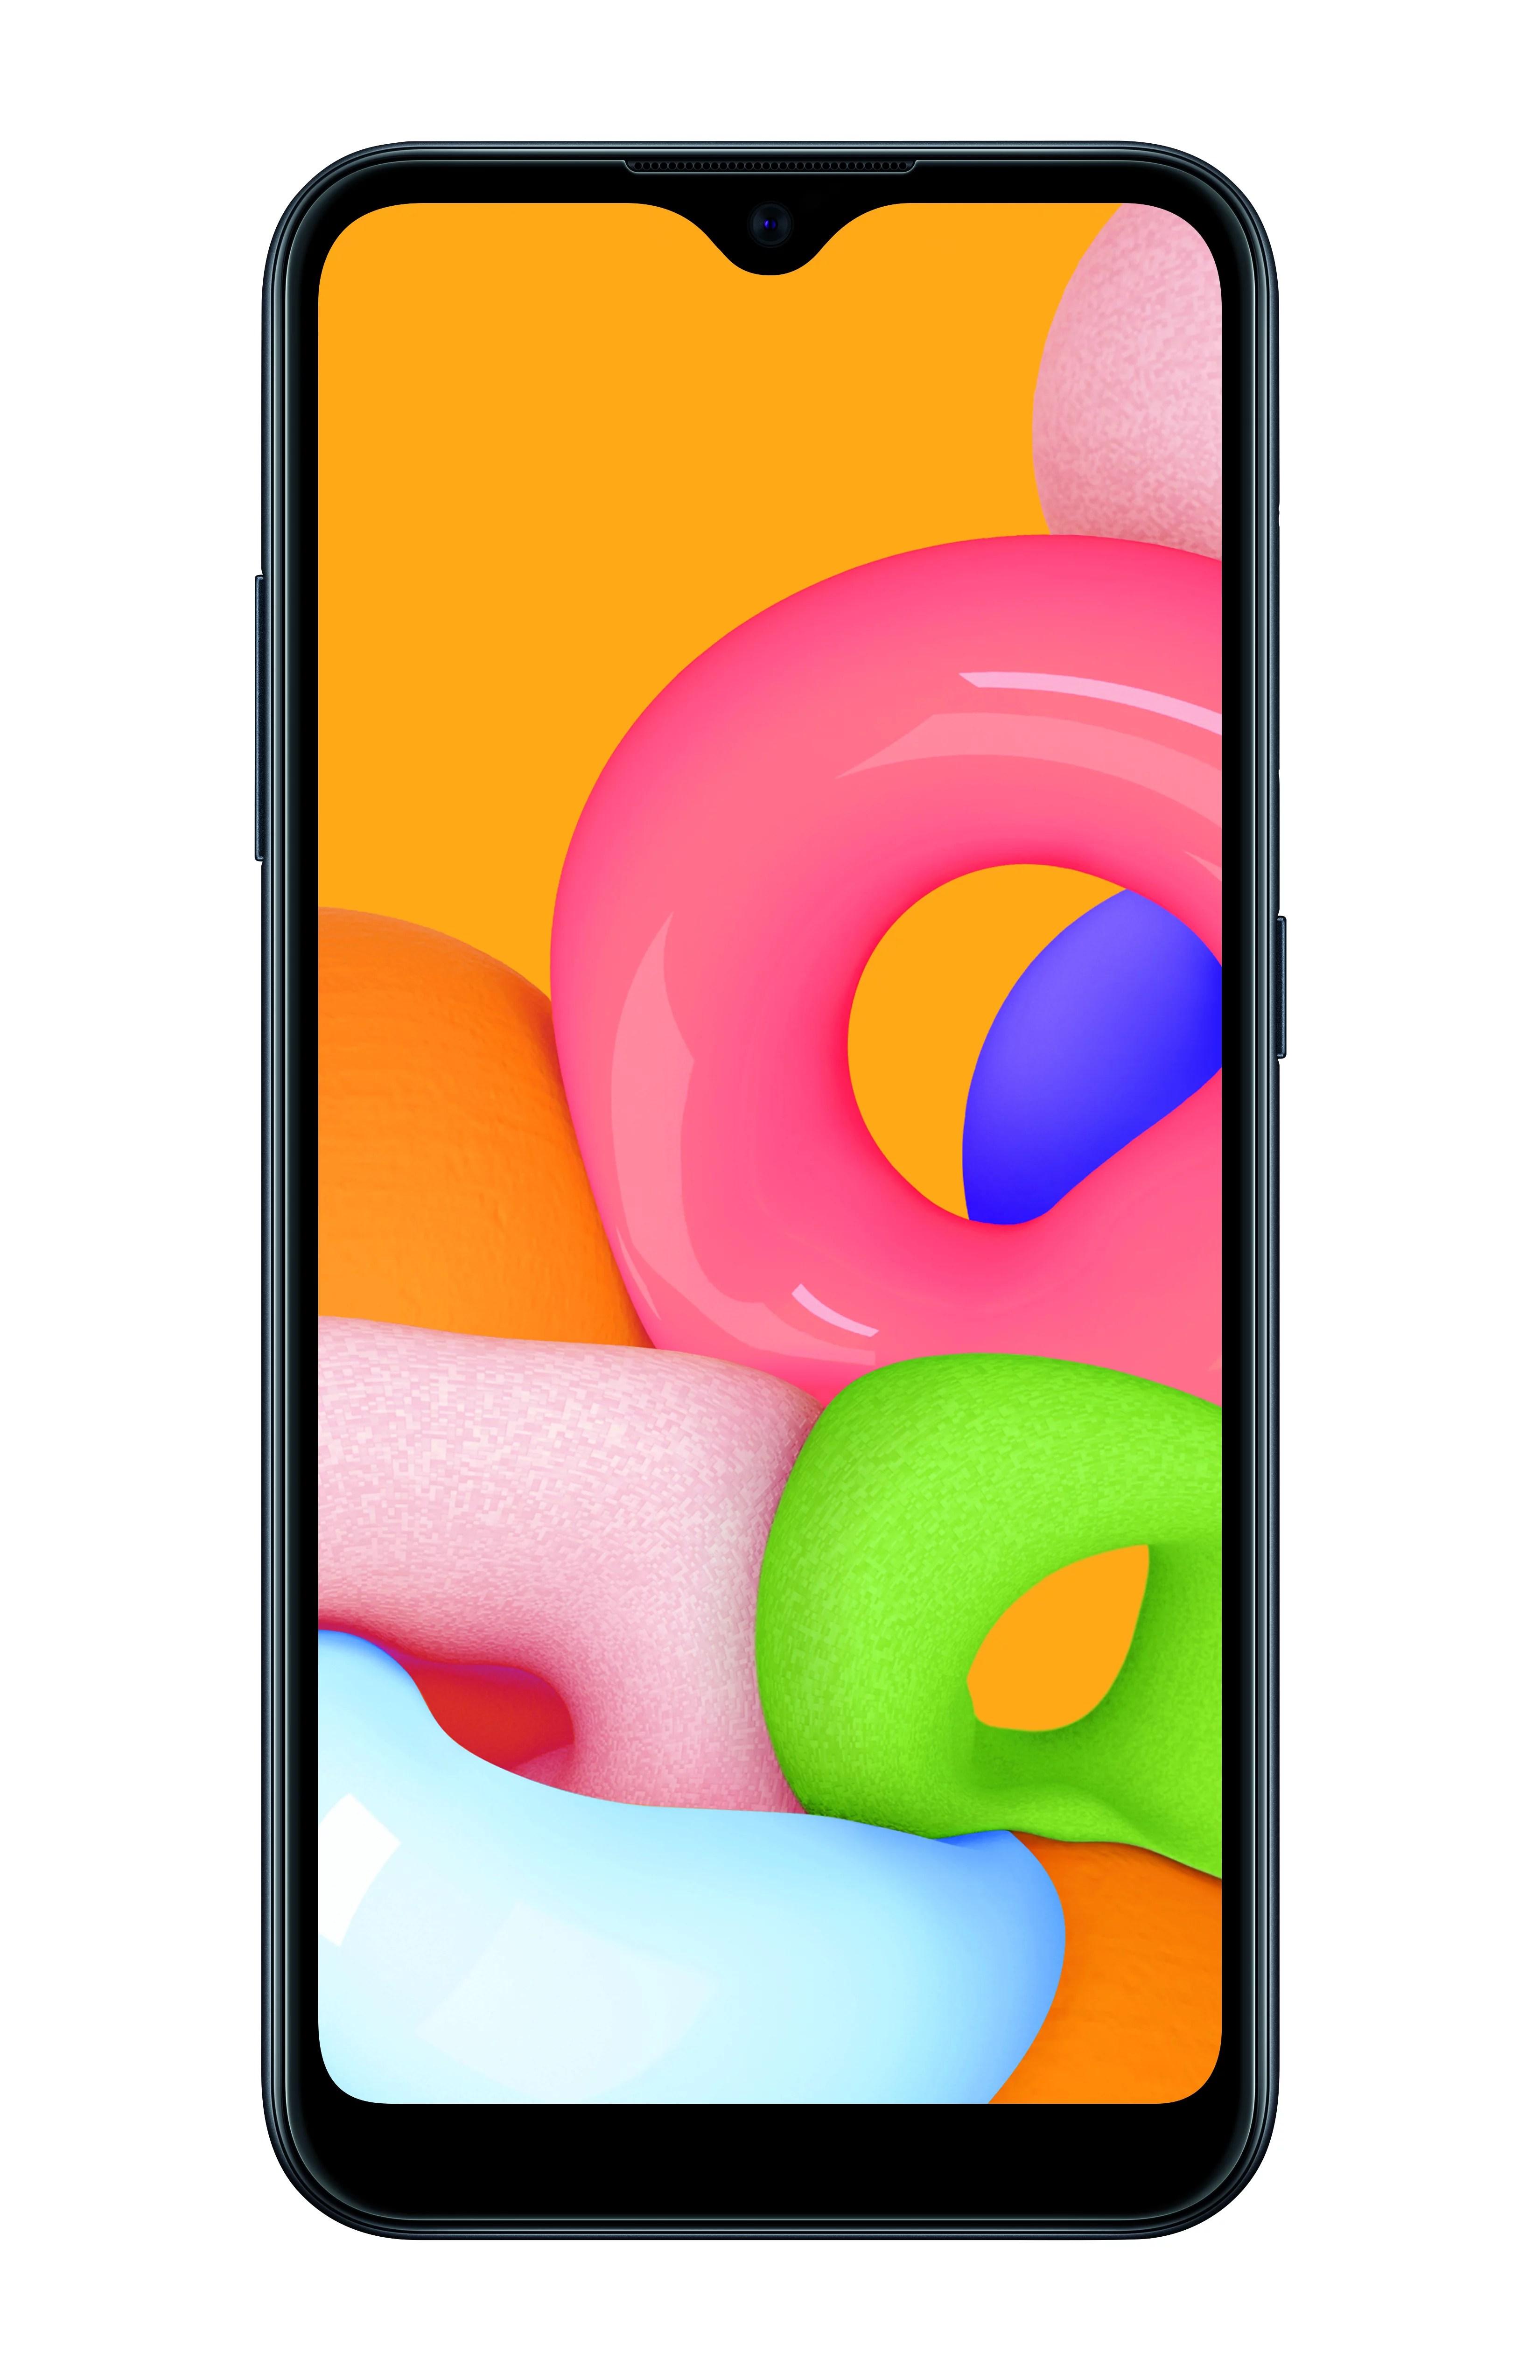 Update Straight Talk Phone Software : update, straight, phone, software, Straight, Samsung, Galaxy, 16GB,, Black, Prepaid, Smartphone, Walmart.com